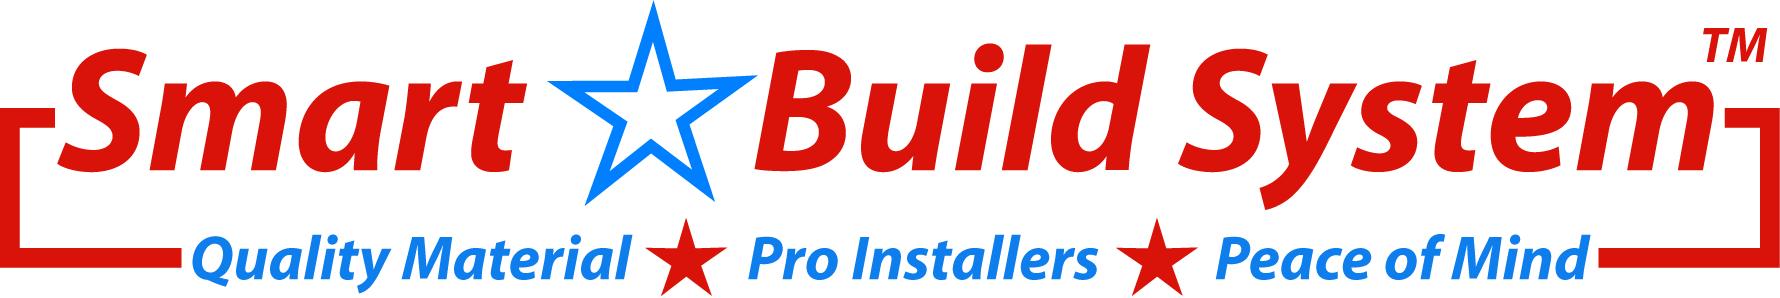 smart build logo.jpg